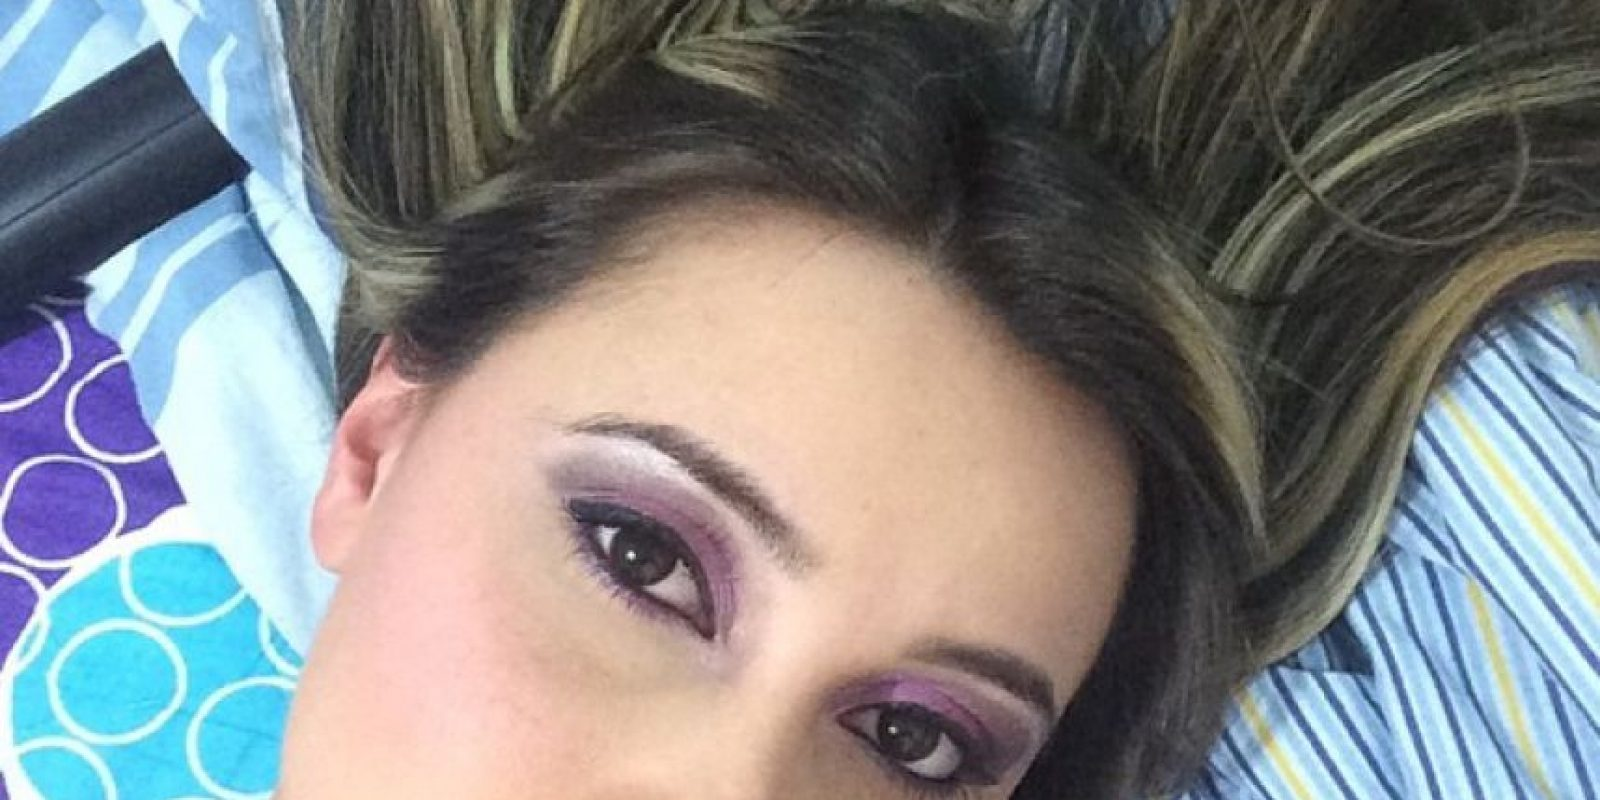 Manuela Gómez Foto:Instagram Manuela Gómez